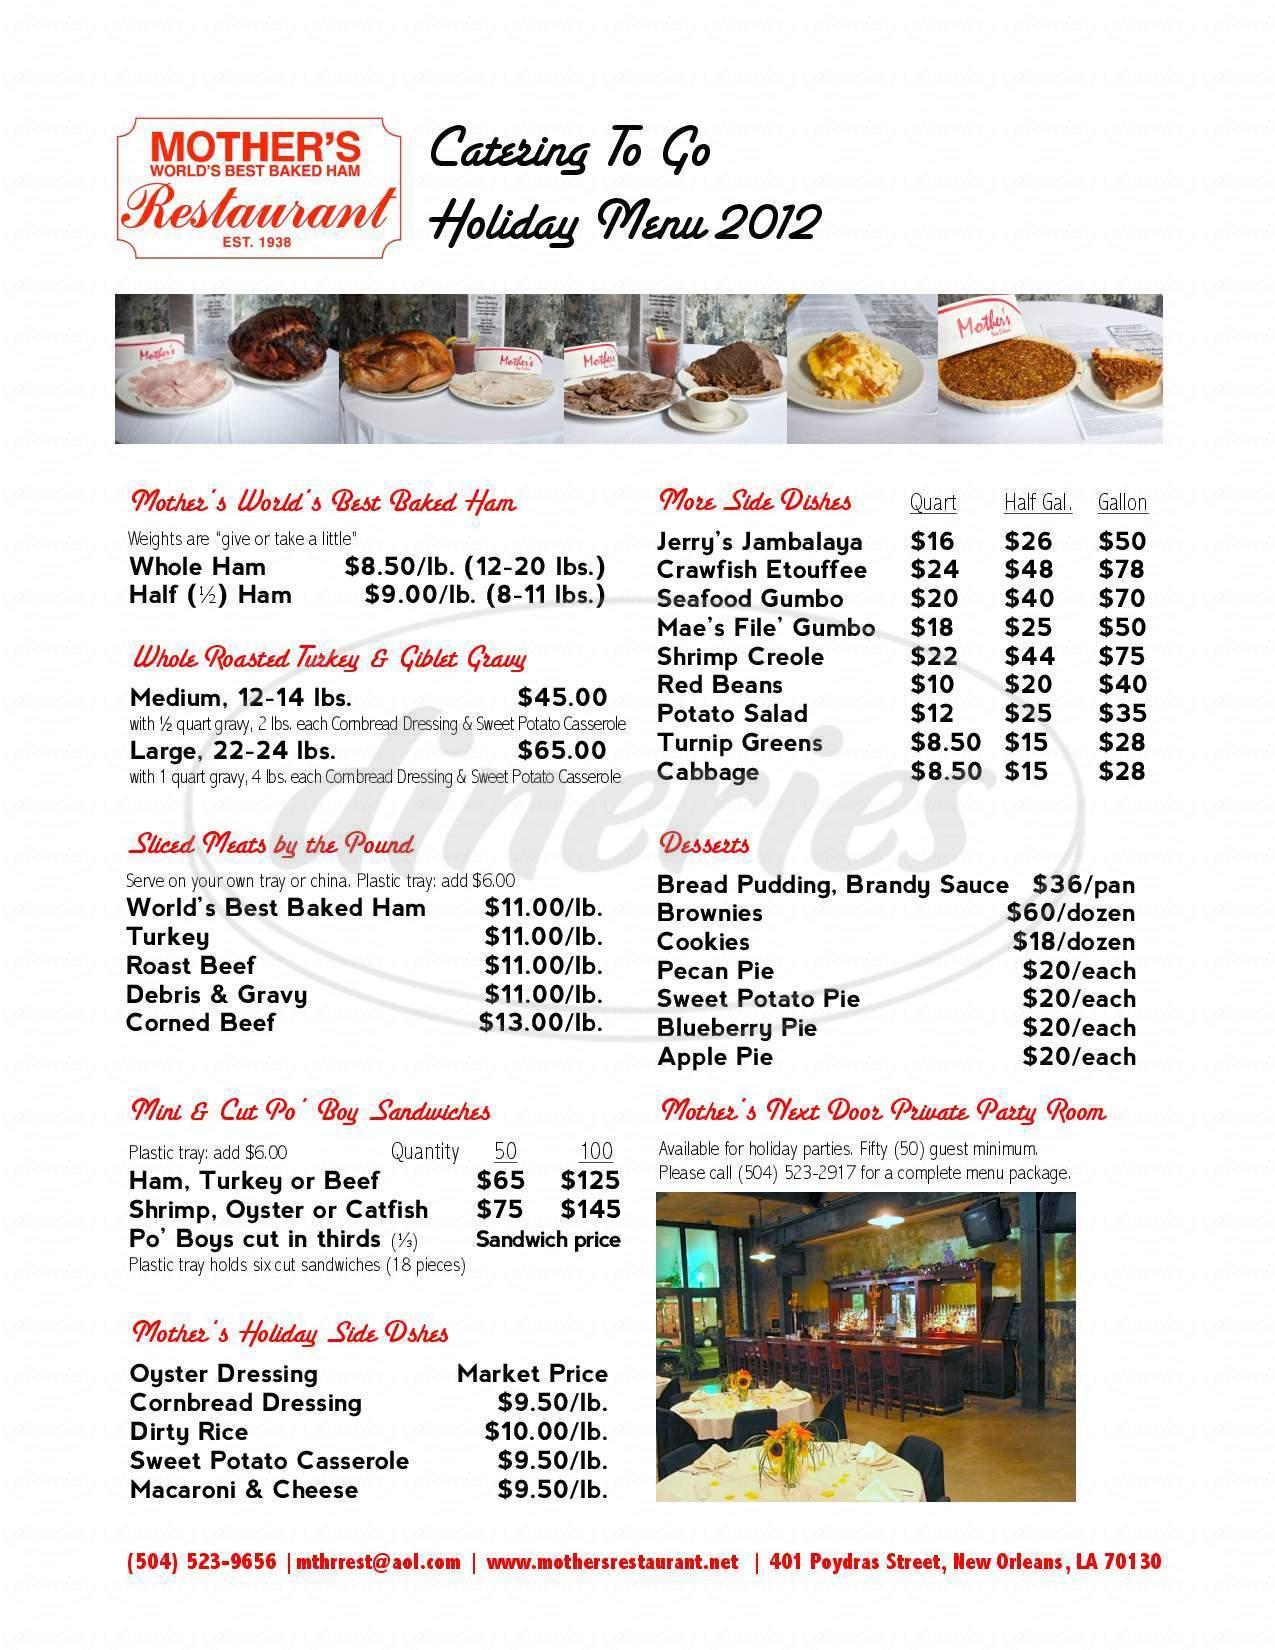 menu for Mother's Restaurant